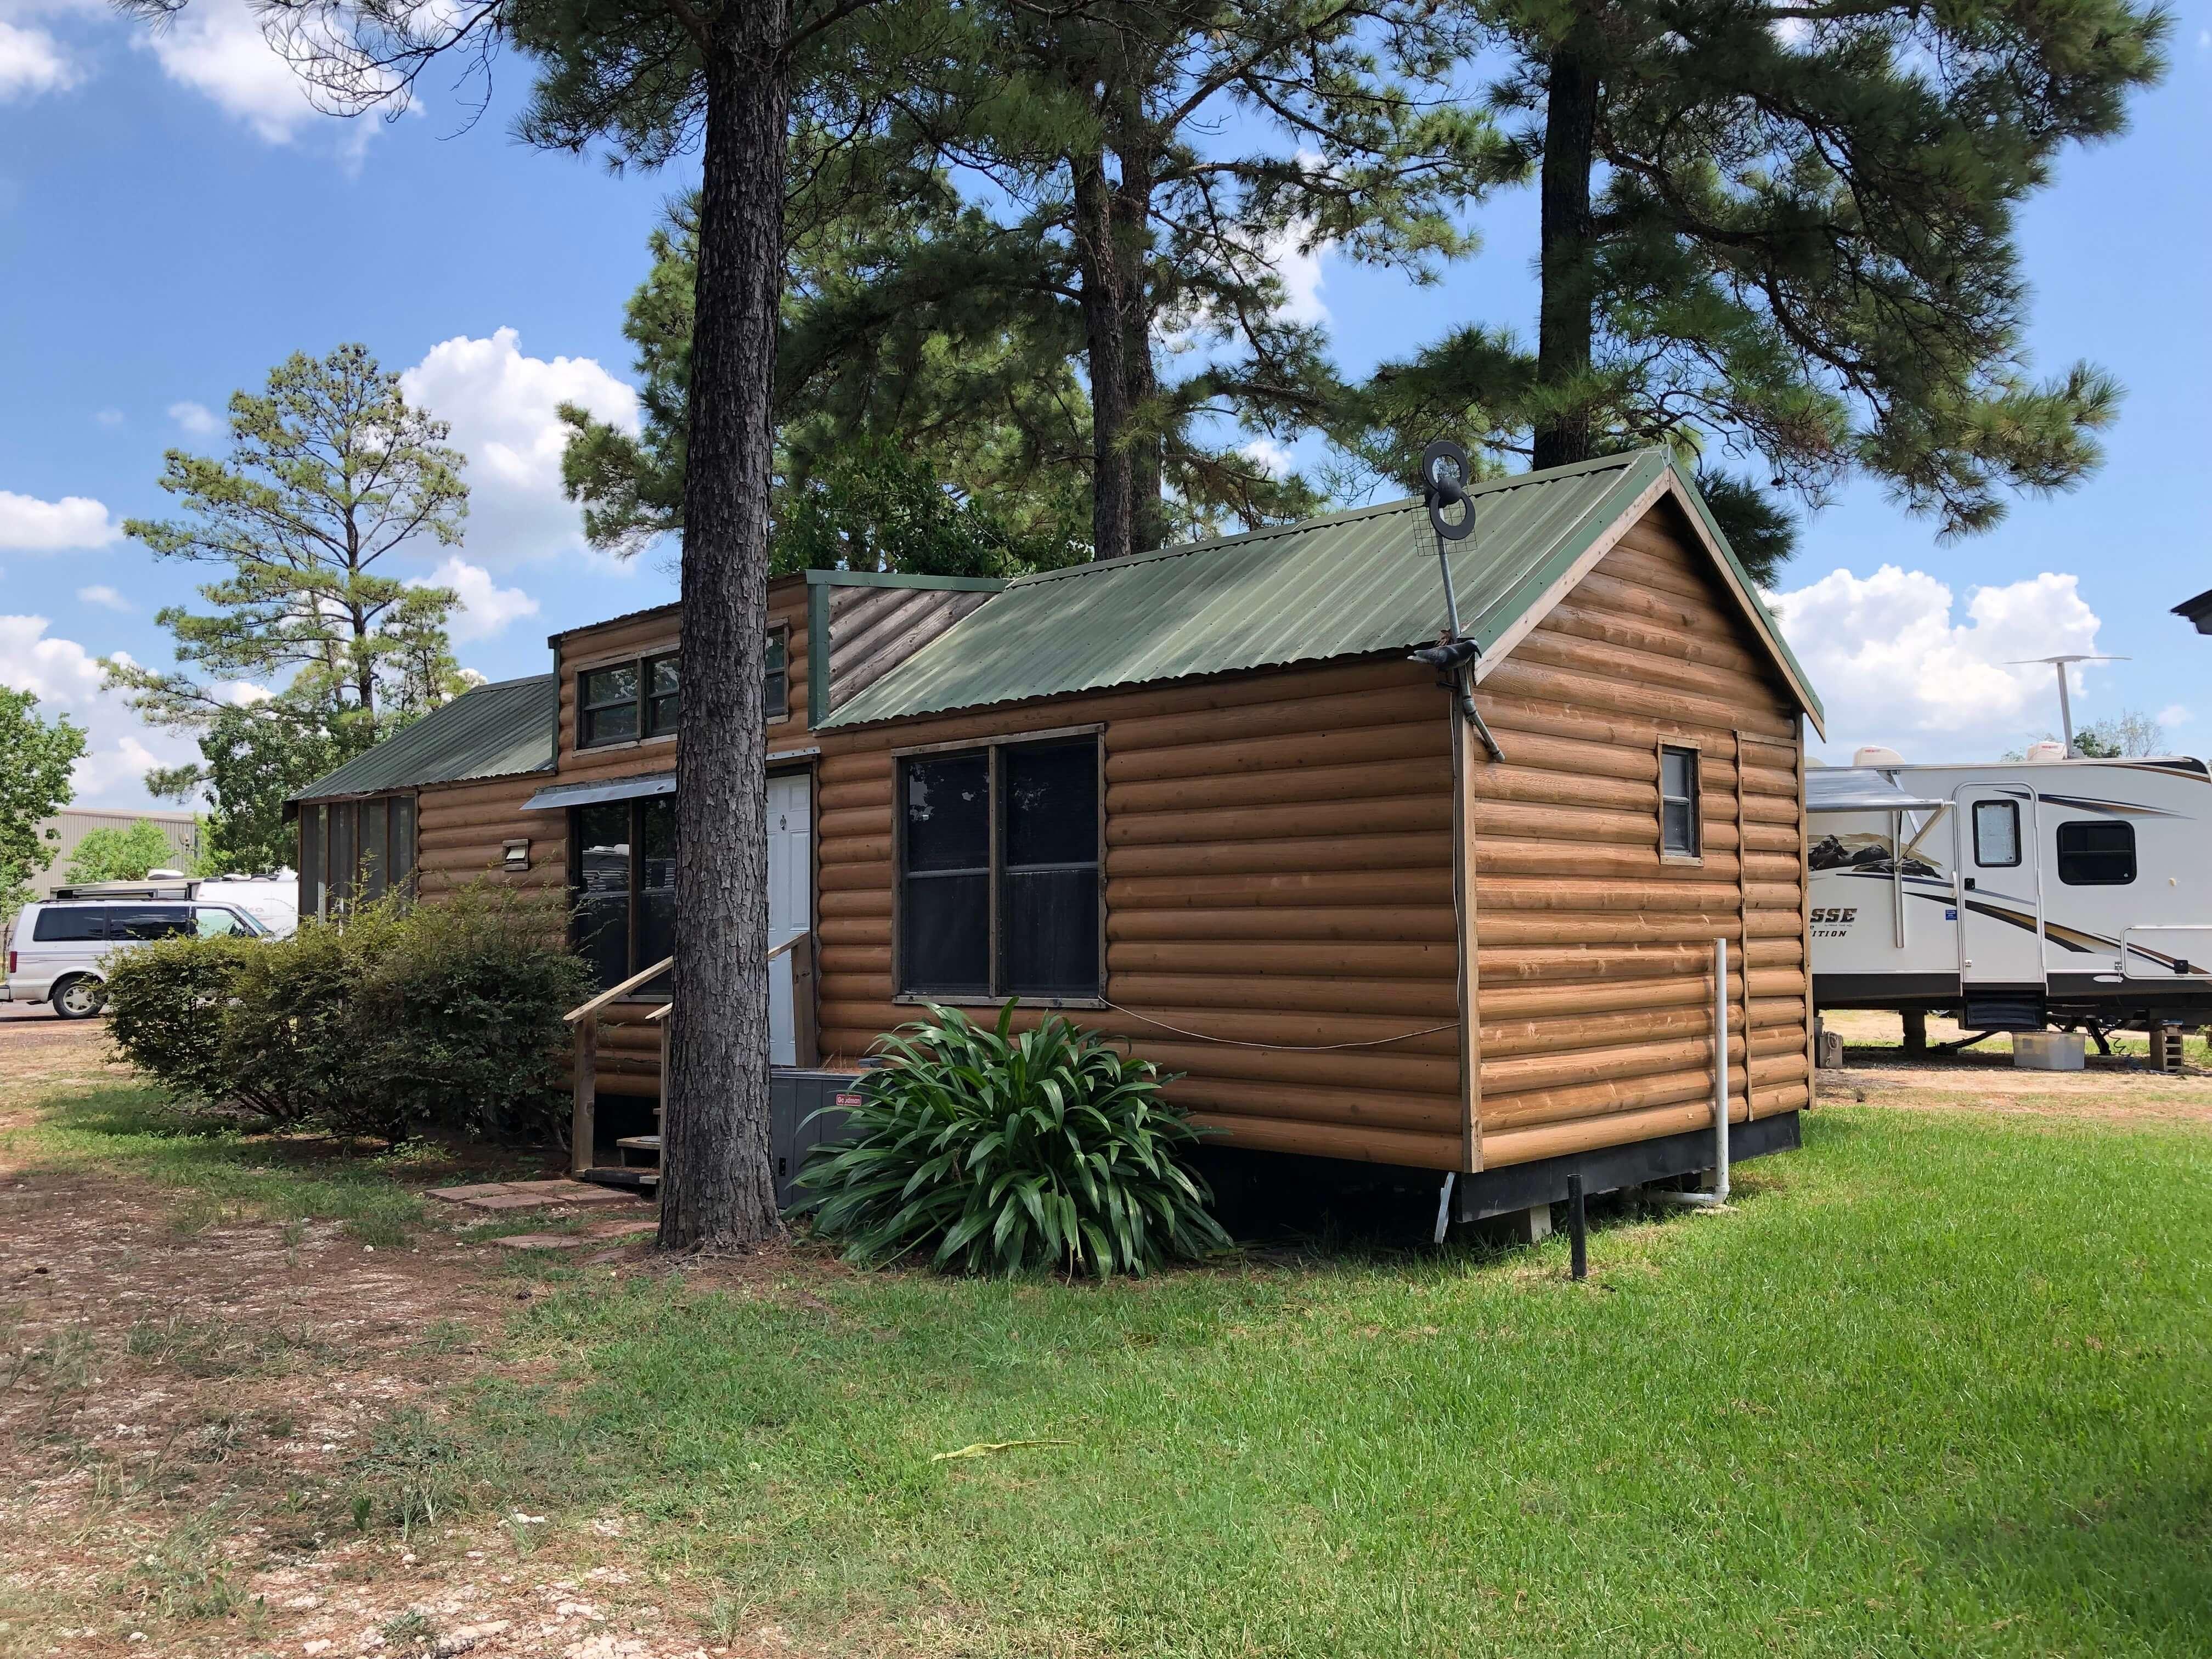 Sheldon Lake RV Resort Image Gallery 15